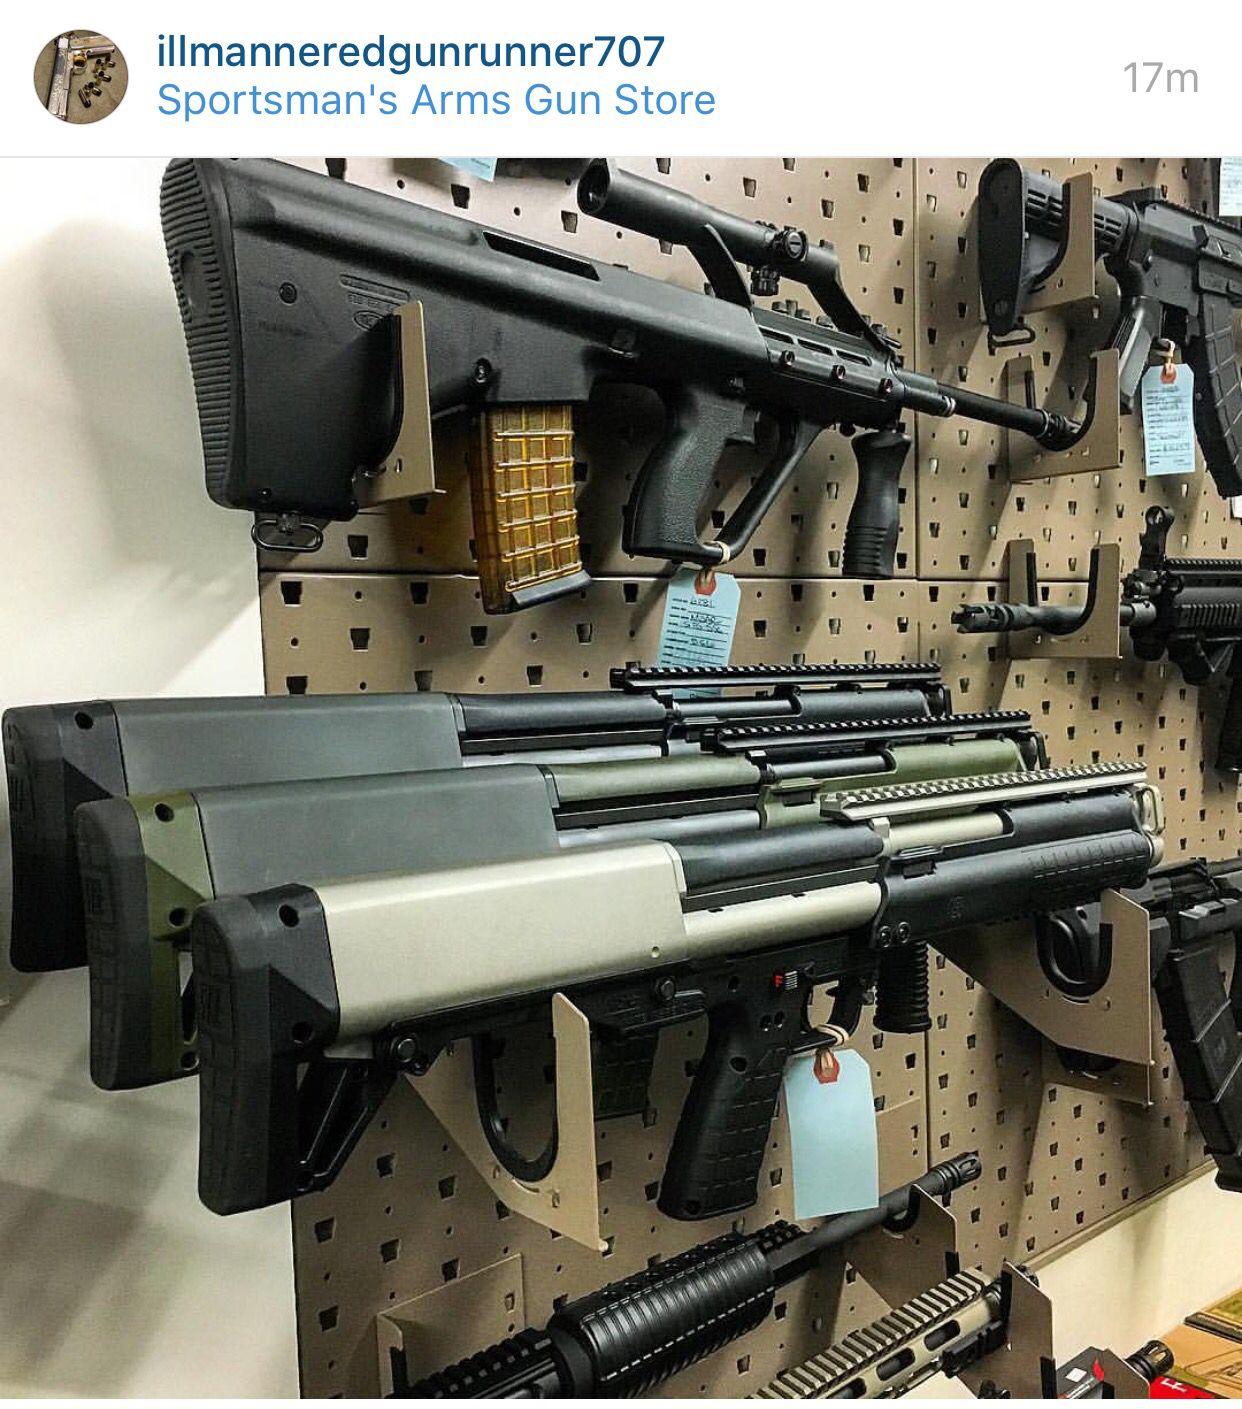 Follow us on Facebook:https://www.facebook.com/Buffalofirearms @beardedguy #BuffaloTactical www.Buffalofirearms.com #ArmedSociety #Ar #223 #ak47 #firearms #1911 #sig #glock #guns #libertarian #liberty #patriot #2A #ghostgun #beararms #michigan #gunsbymail #btac #buffalo #buffalofirearms #molonlabe #greendragon